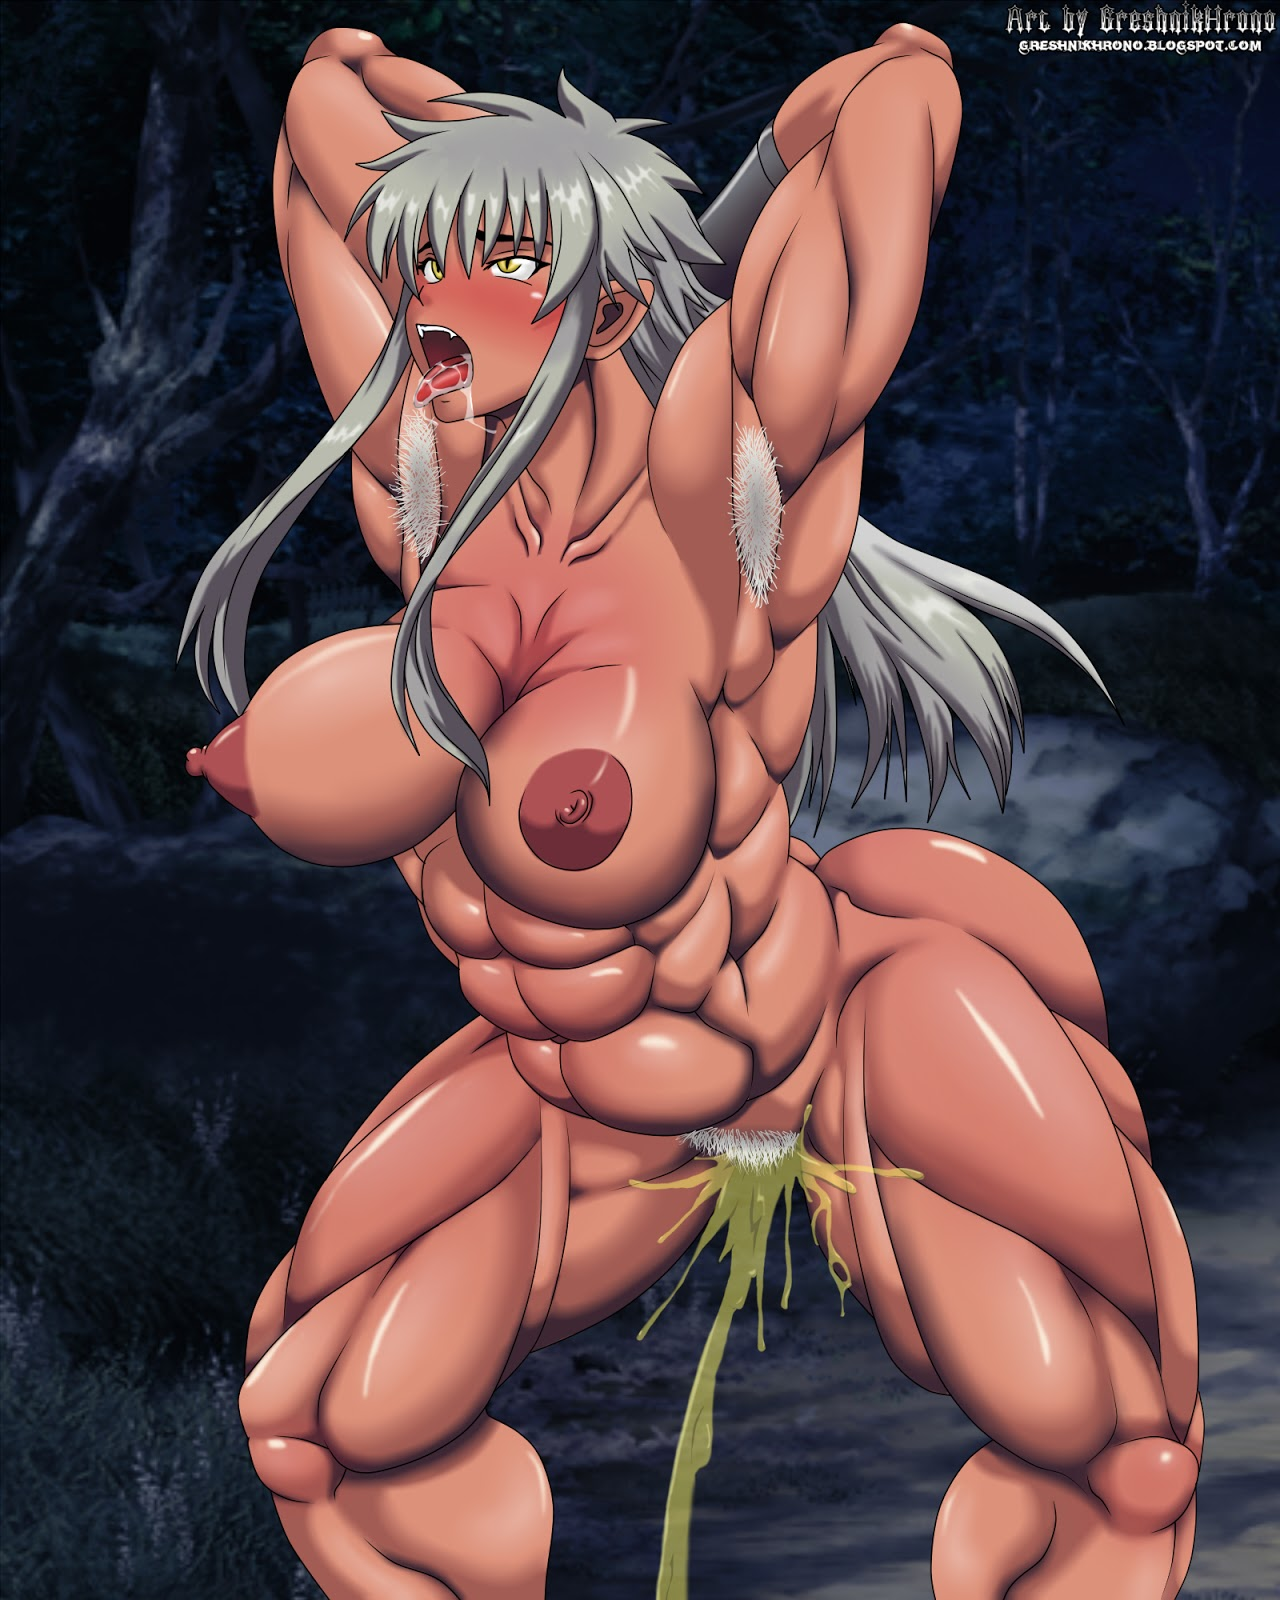 Daily motion hentai pics 688